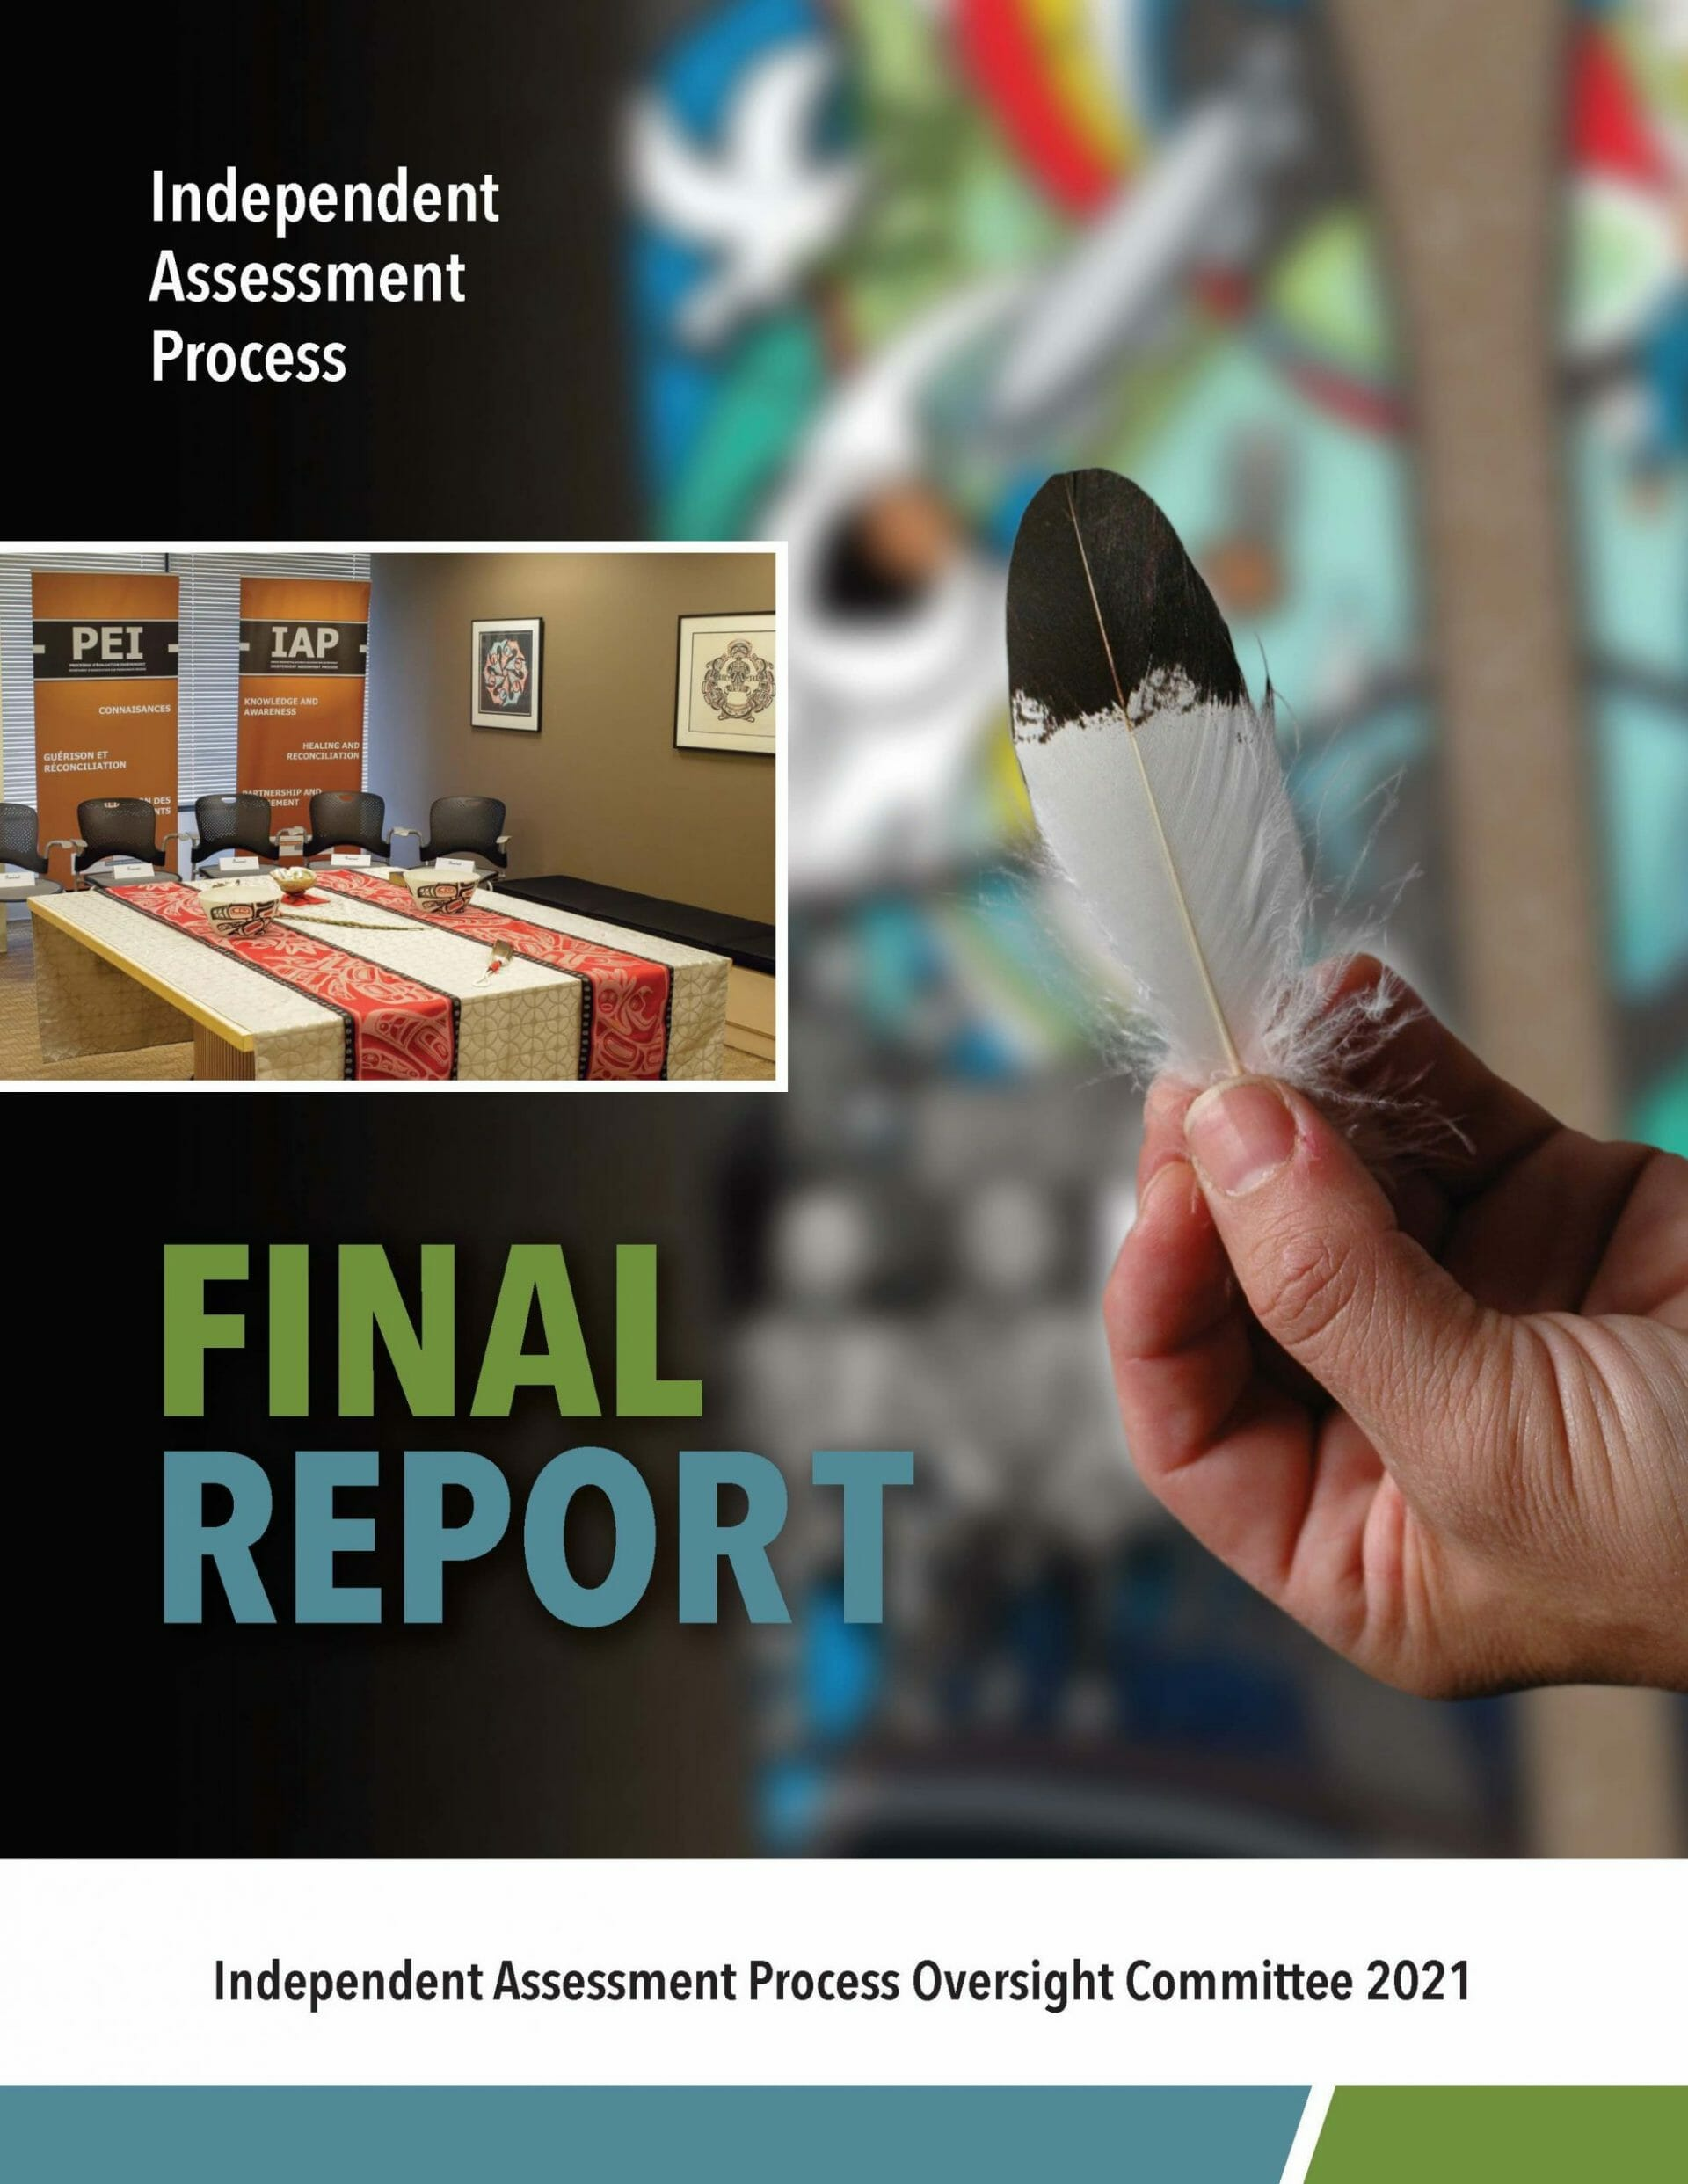 Independent Assessment Process Final Report